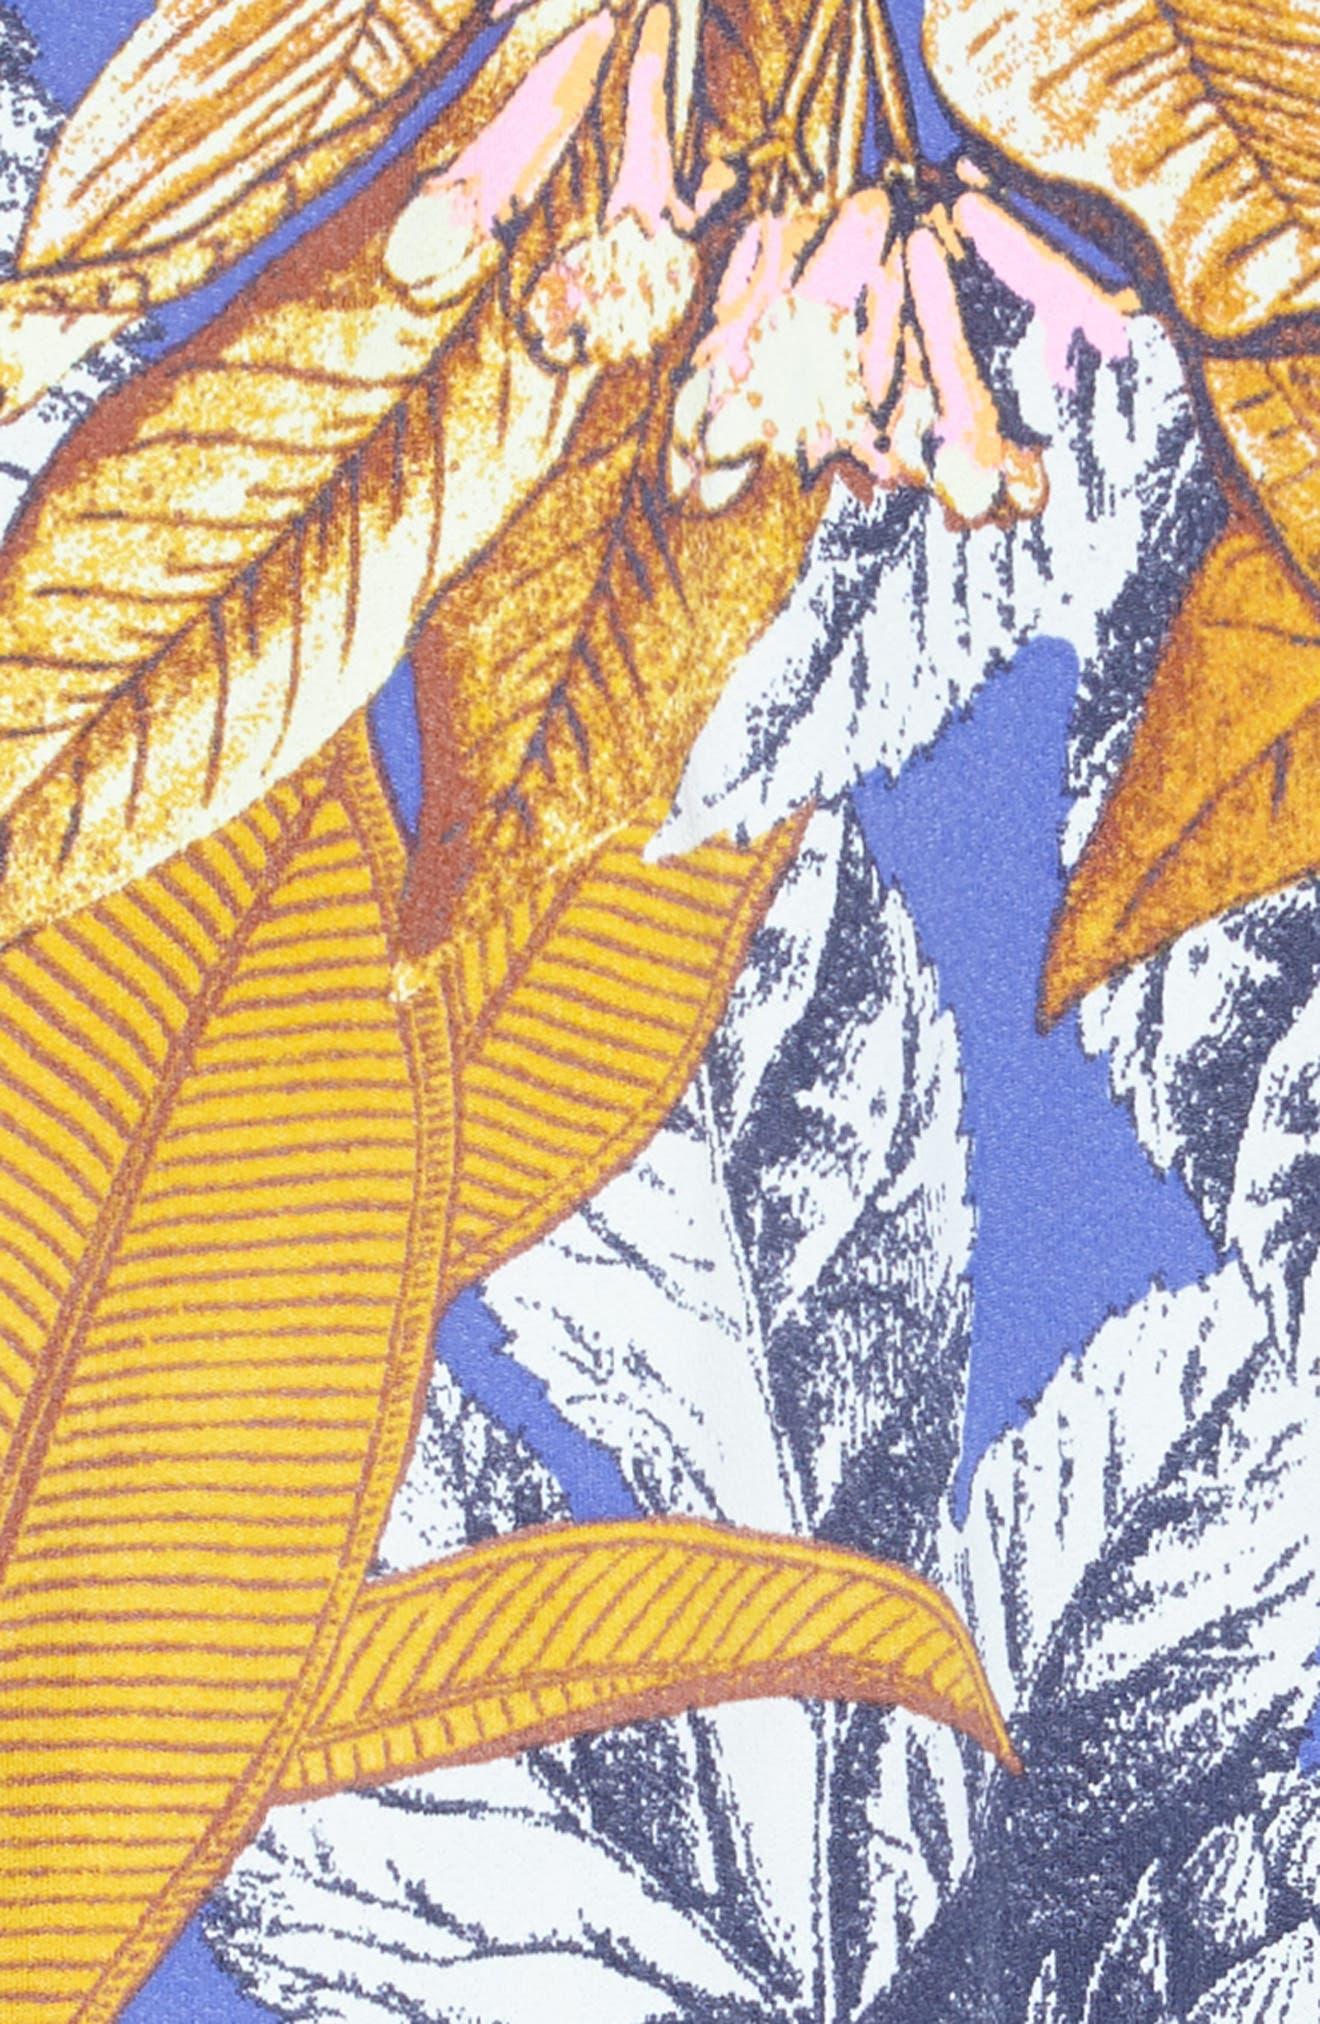 Ocean Call Cover-Up Dress,                             Alternate thumbnail 3, color,                             400